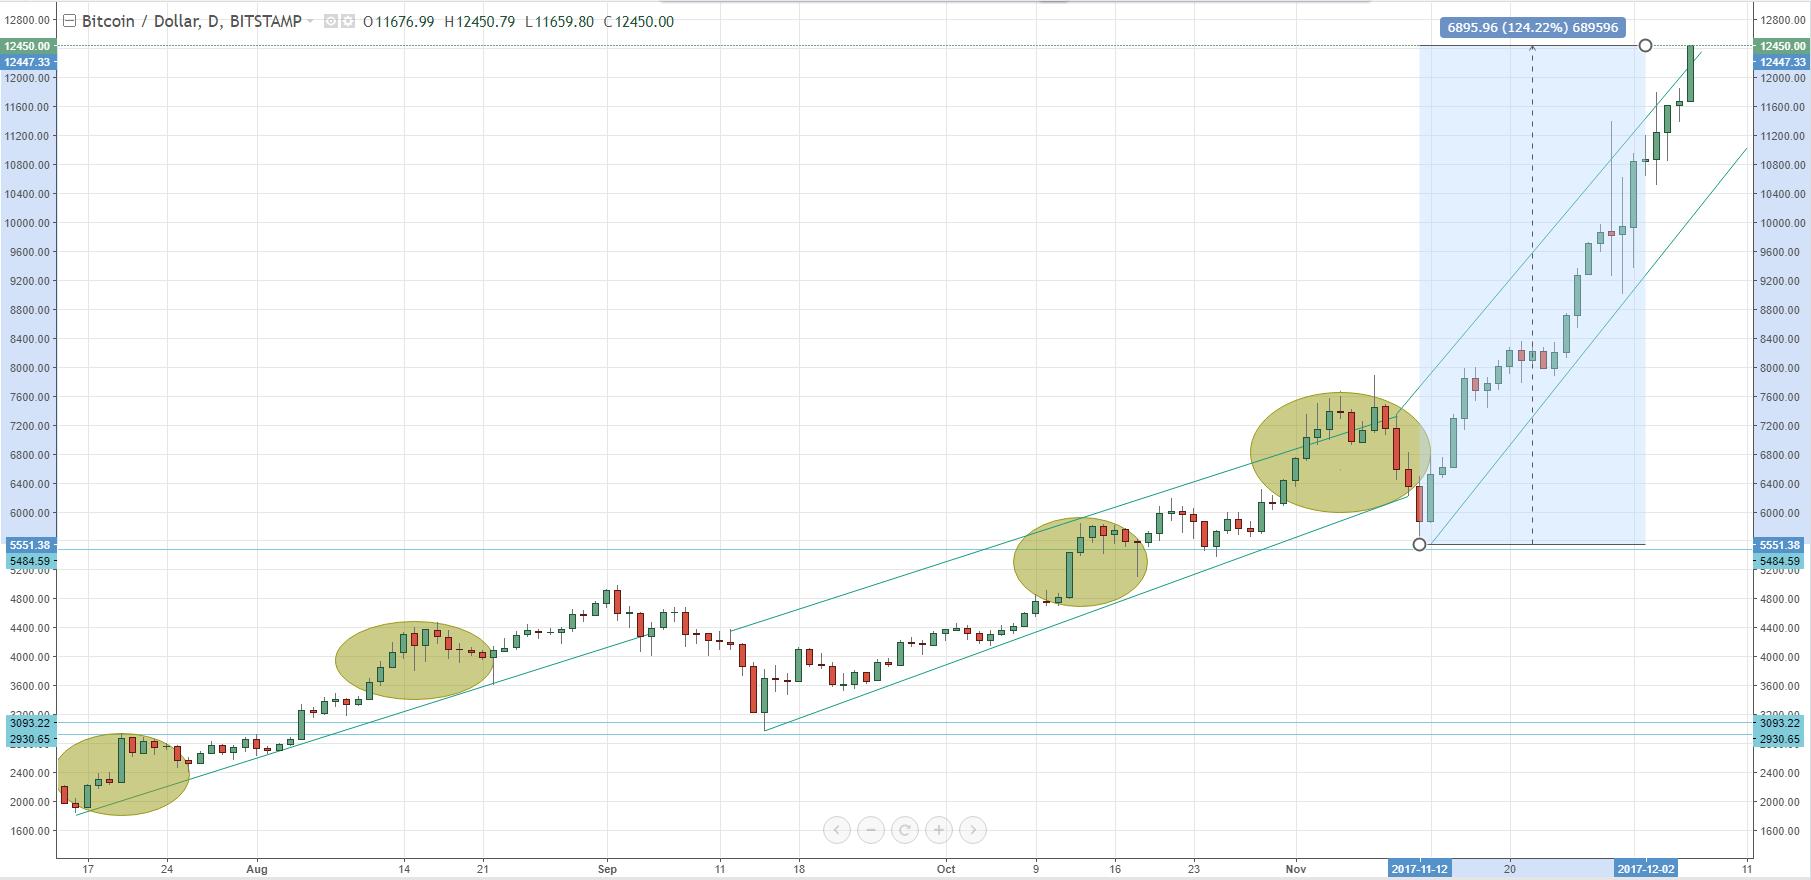 iota cryptocurrency price aud